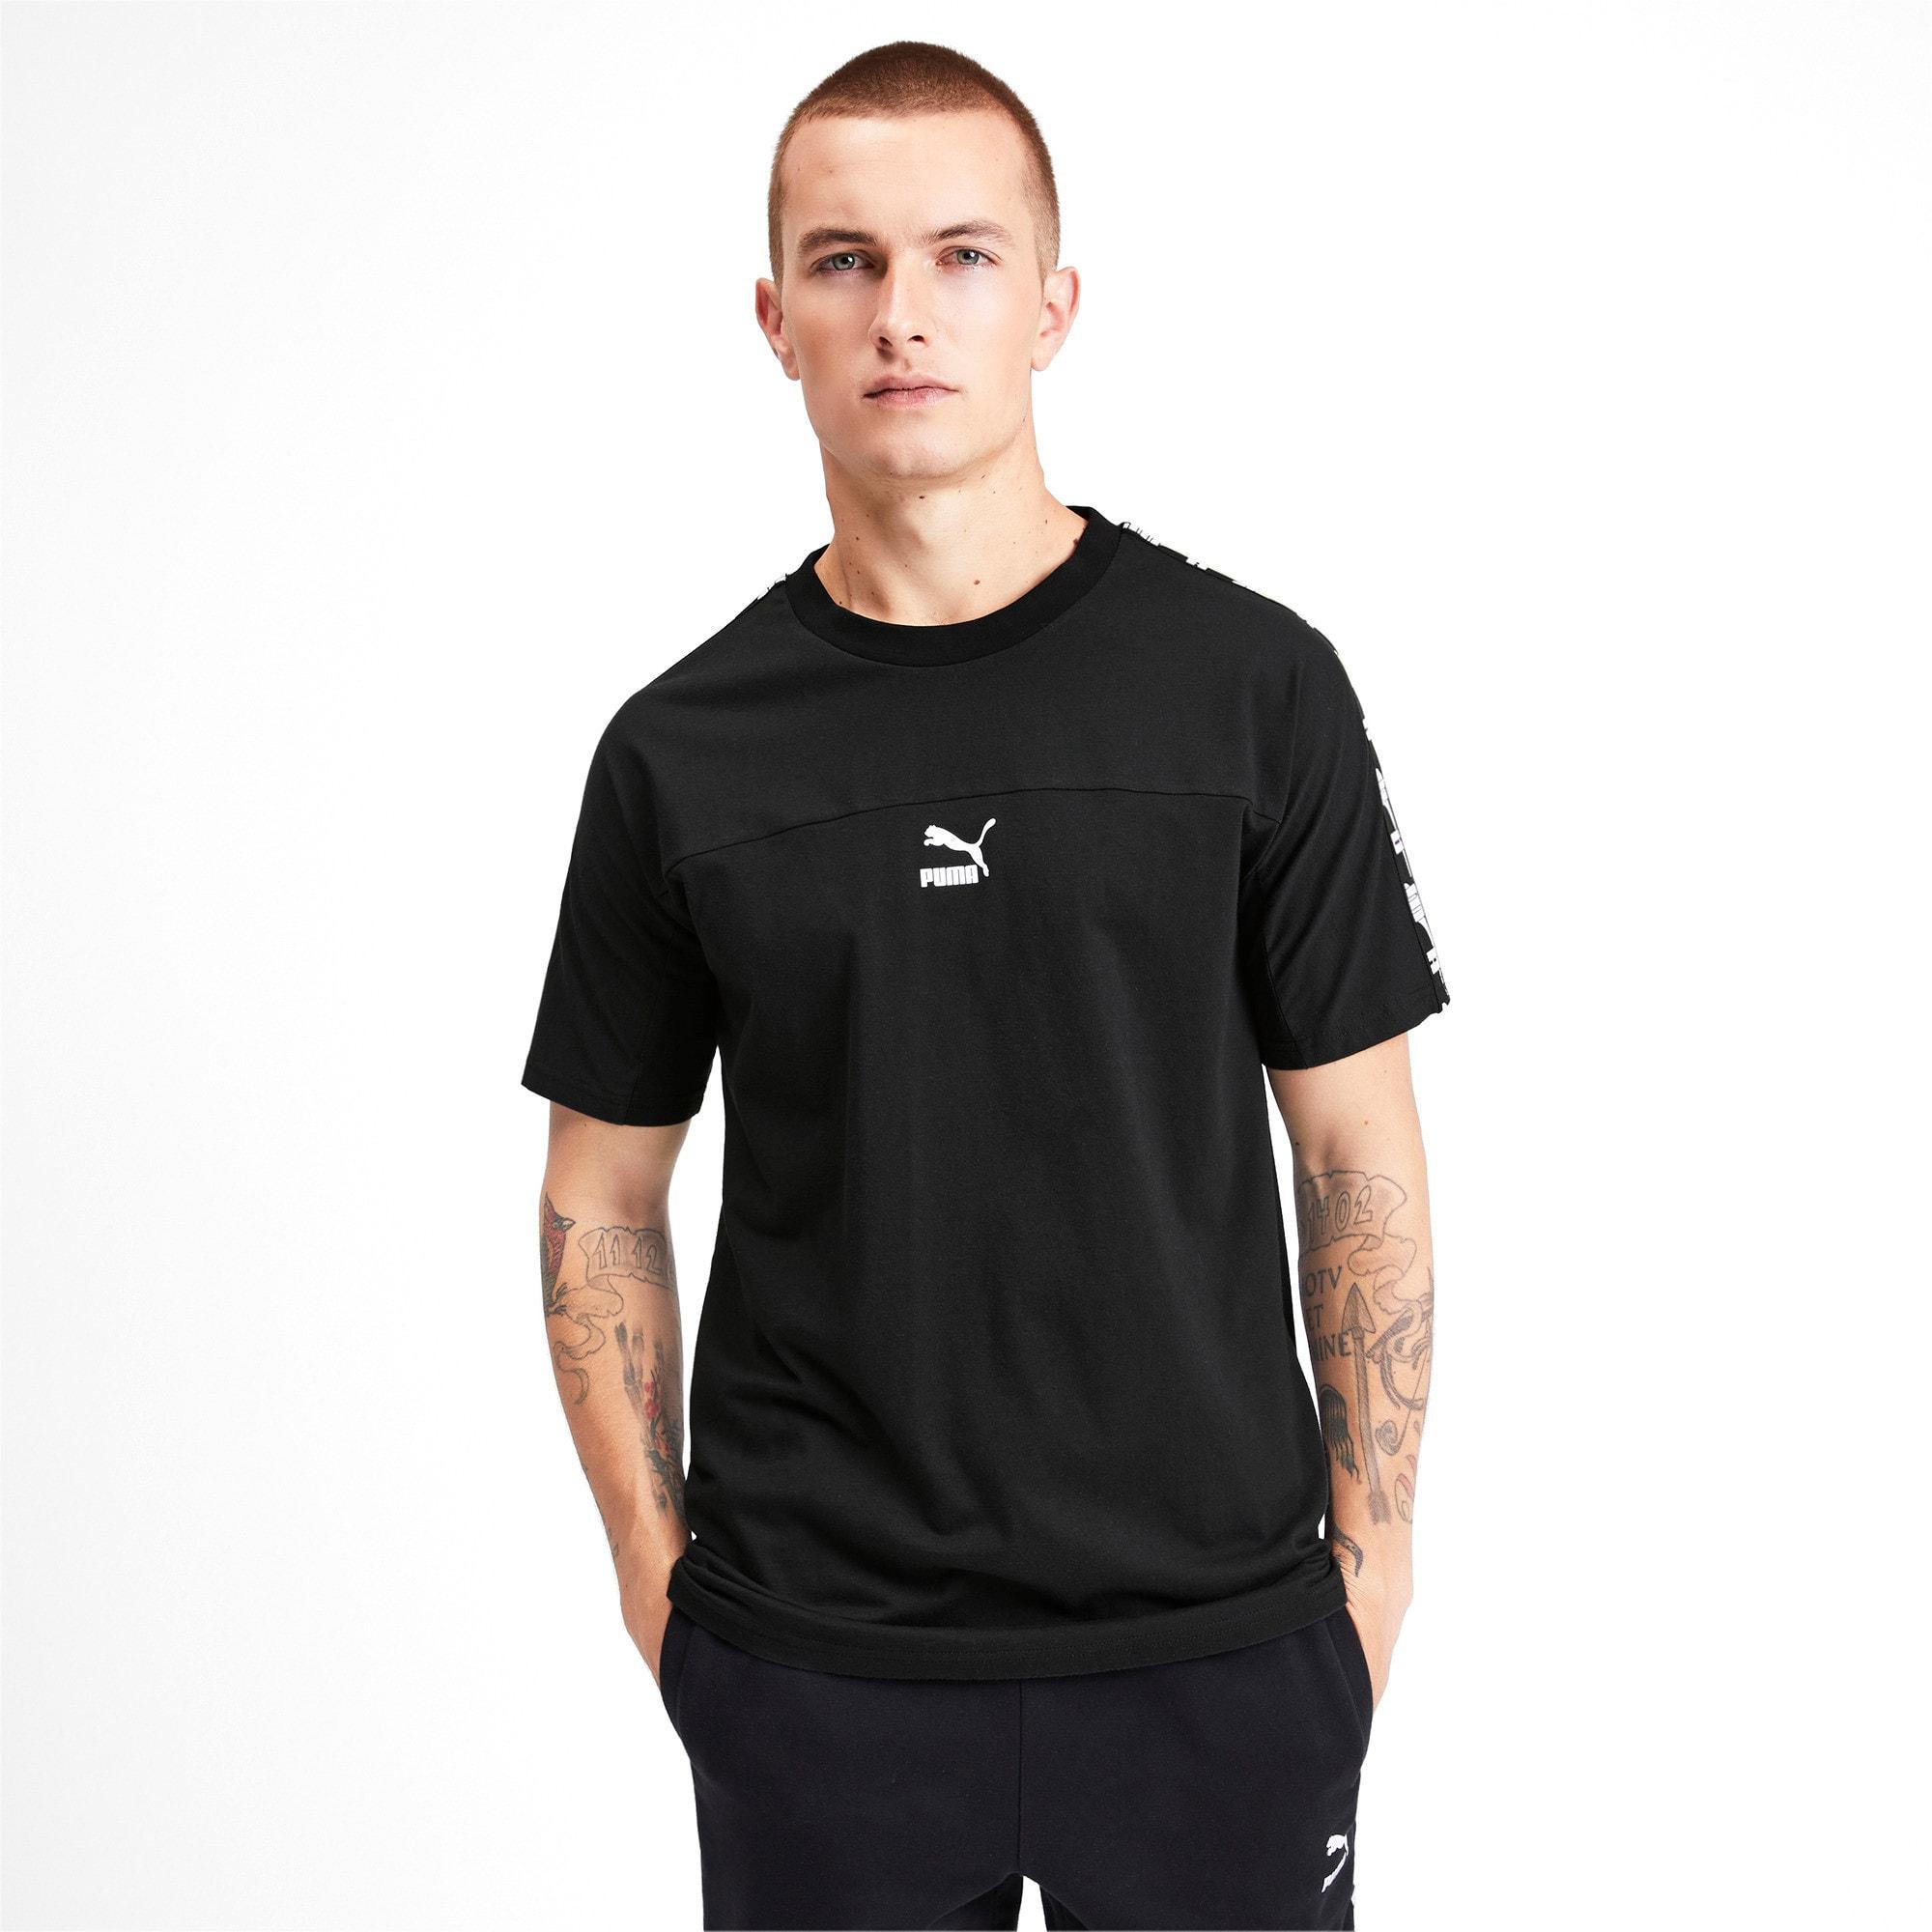 Thumbnail 2 of PUMA XTG SS Tシャツ, Puma Black, medium-JPN